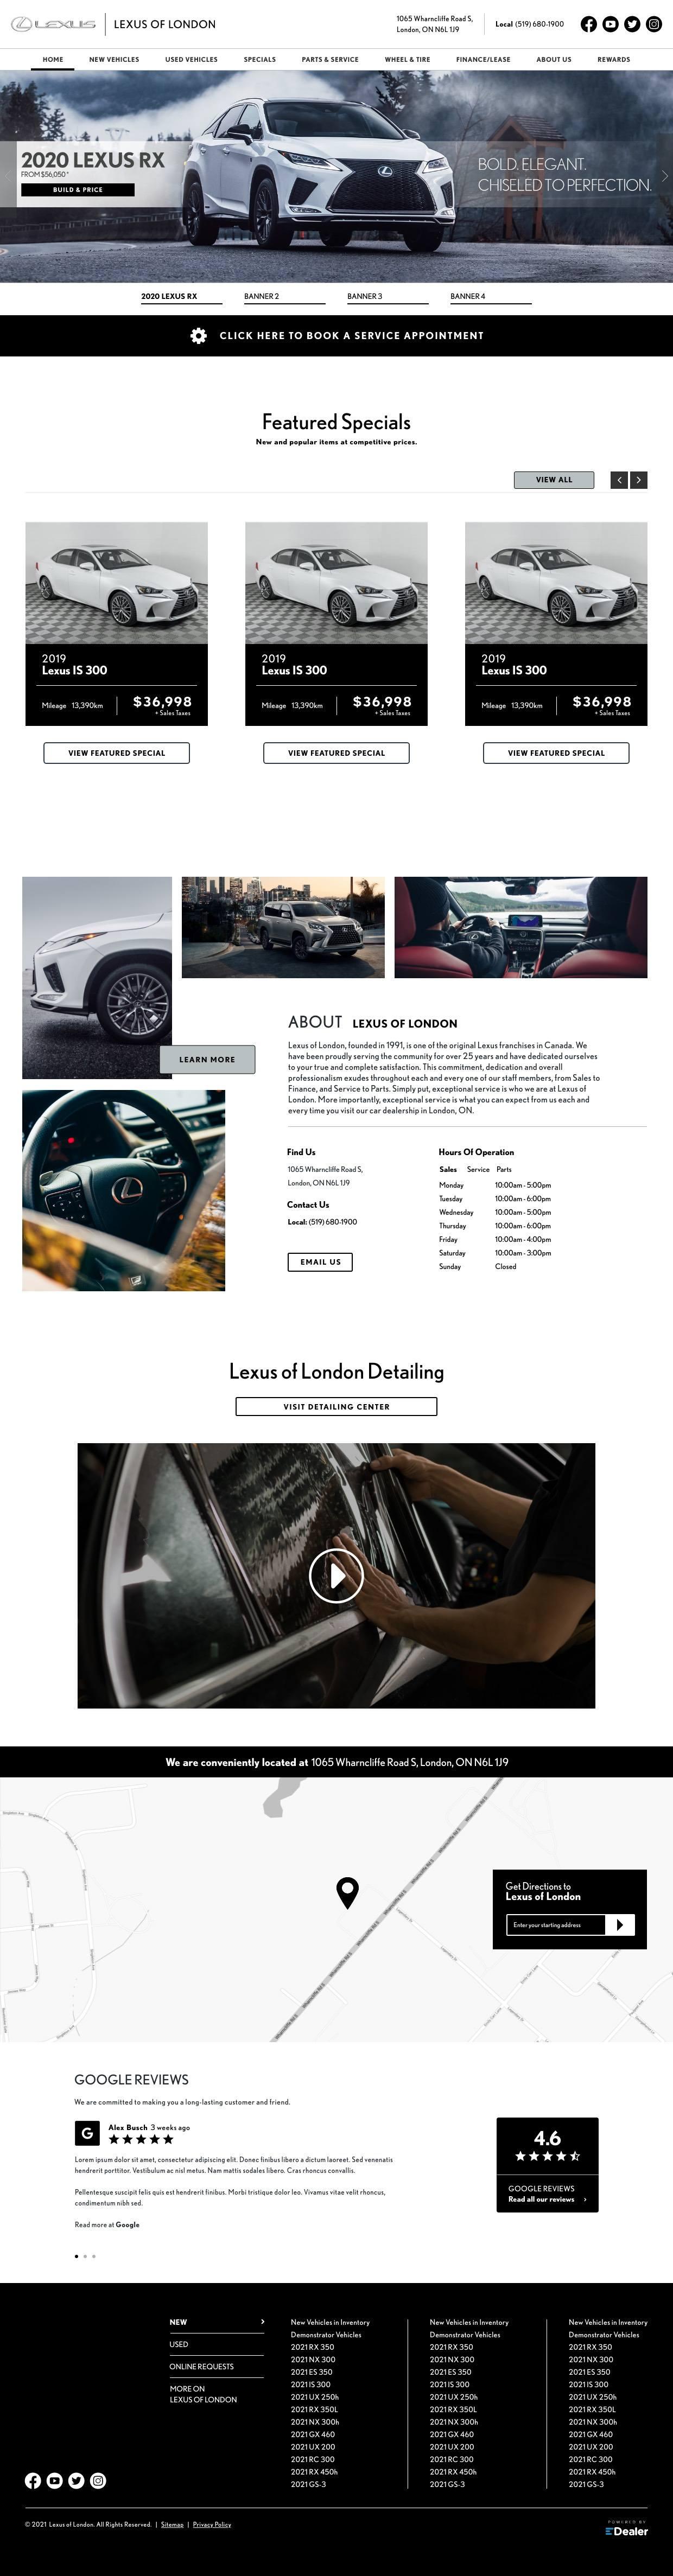 Lexus Of London